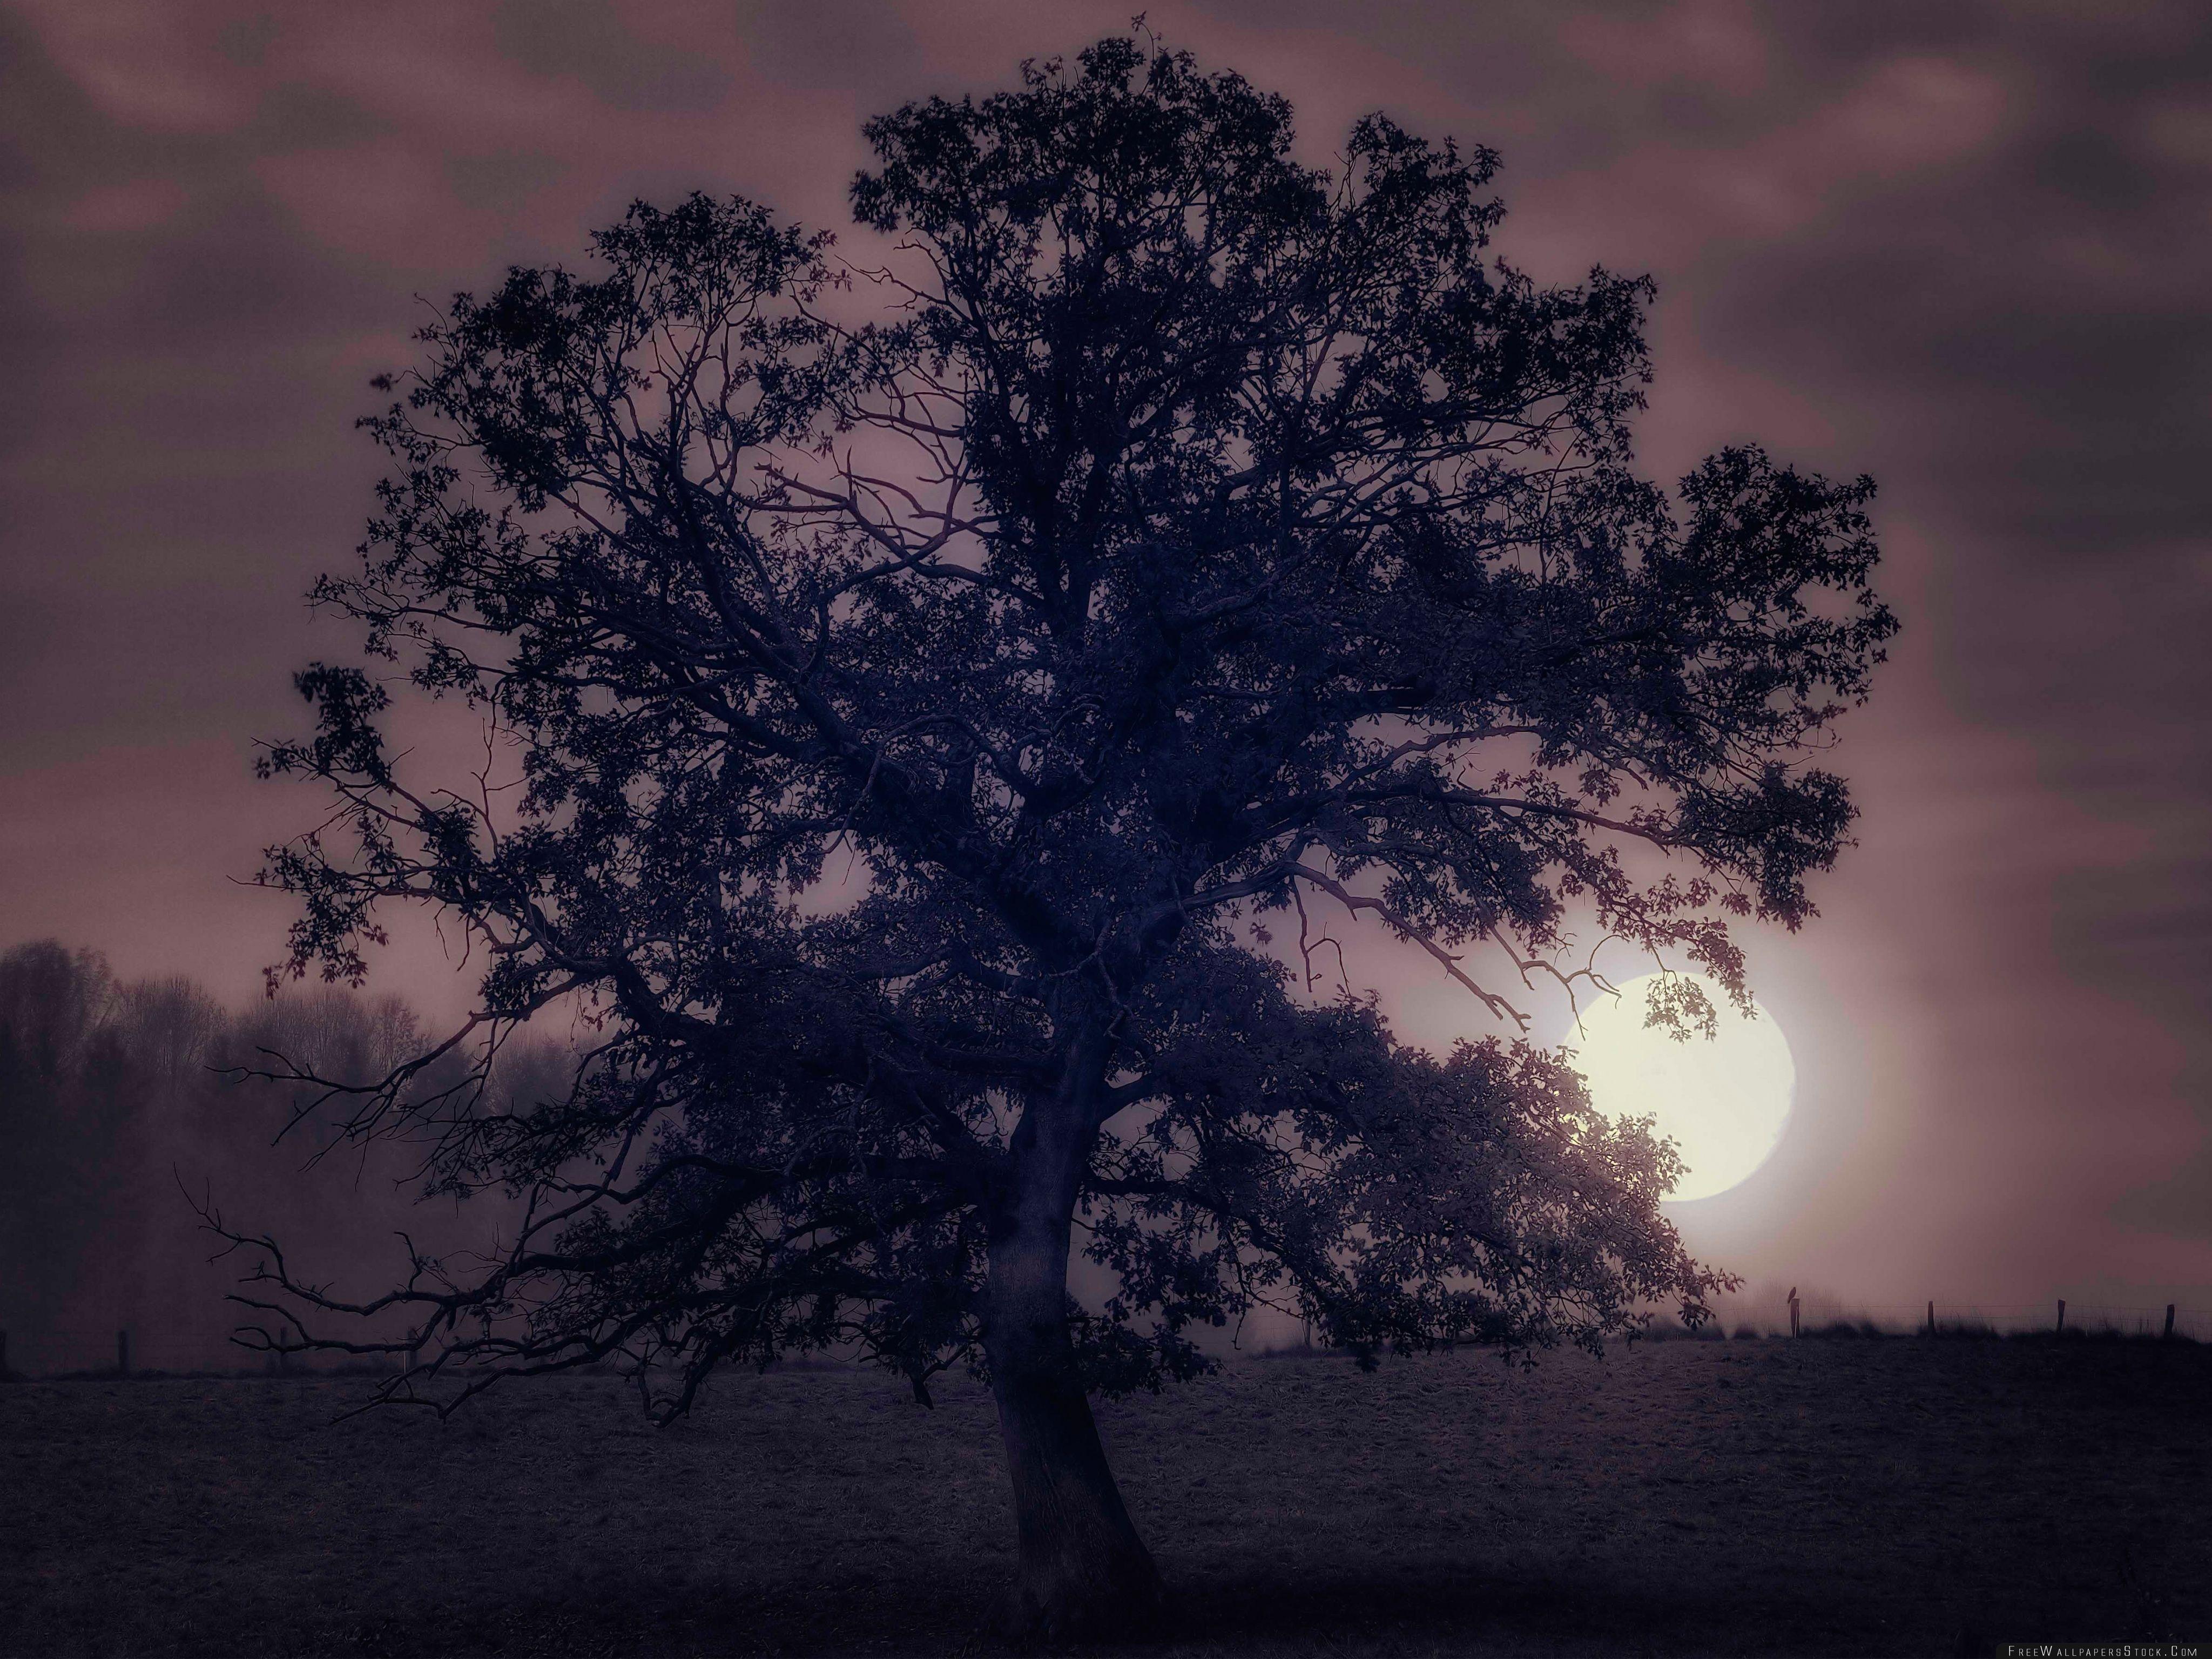 Download Free Wallpaper Tree Under Full Moon